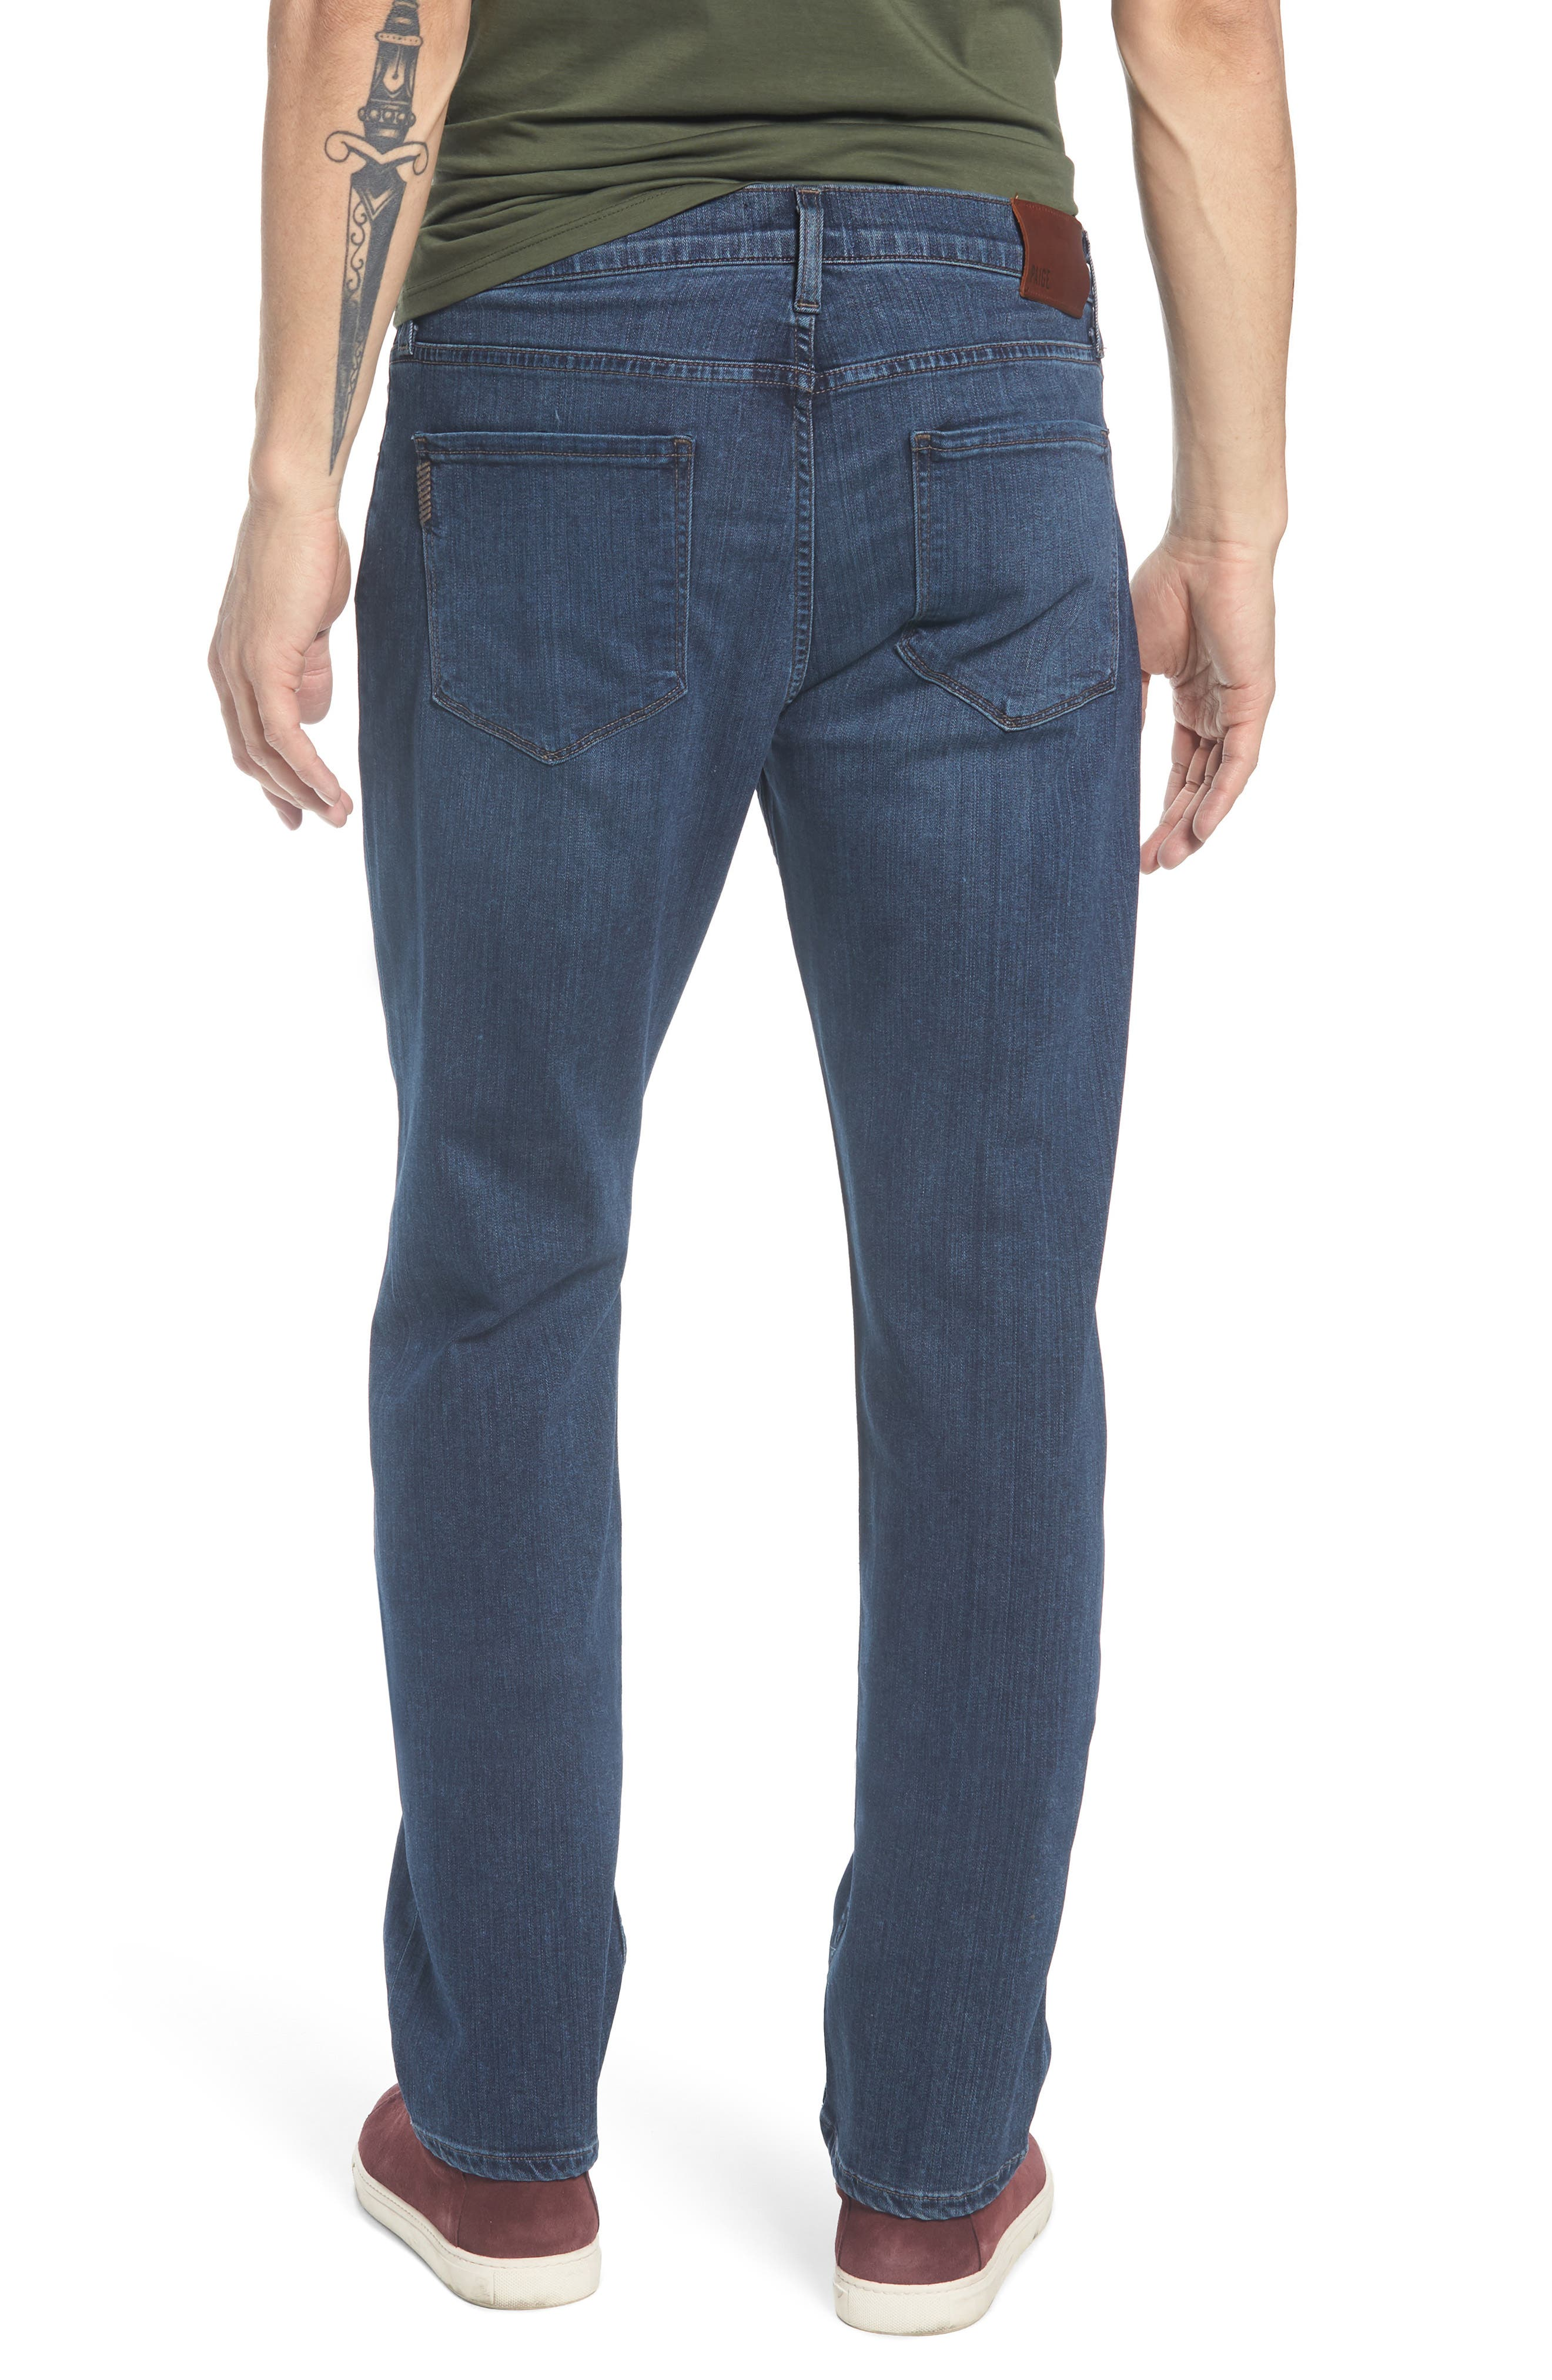 Normandie Straight Leg Jeans,                             Alternate thumbnail 2, color,                             Lowe